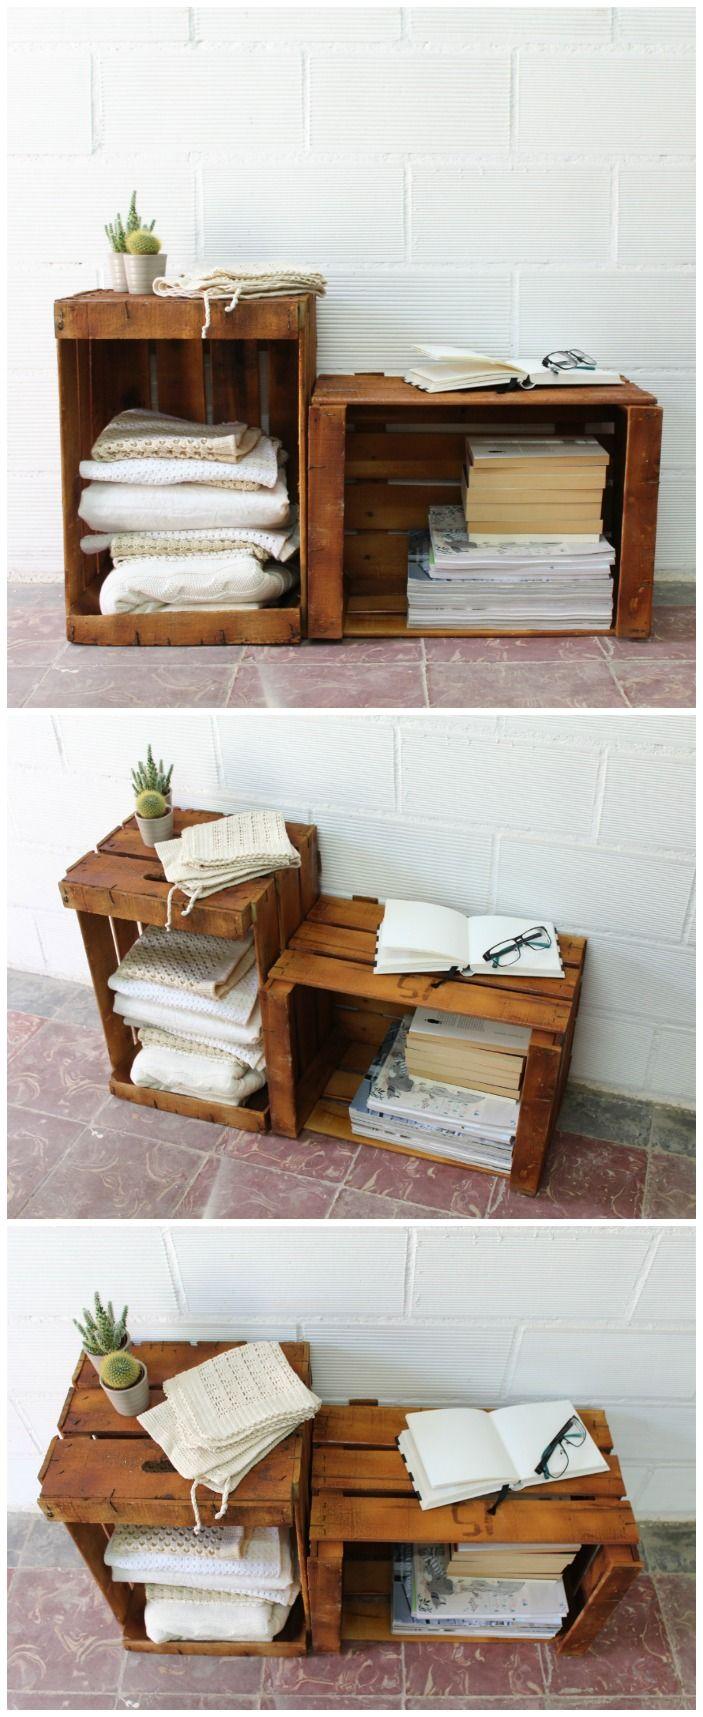 Cajas de fruta caja de madera cajas de madera wood box - Cajas madera frutas ...